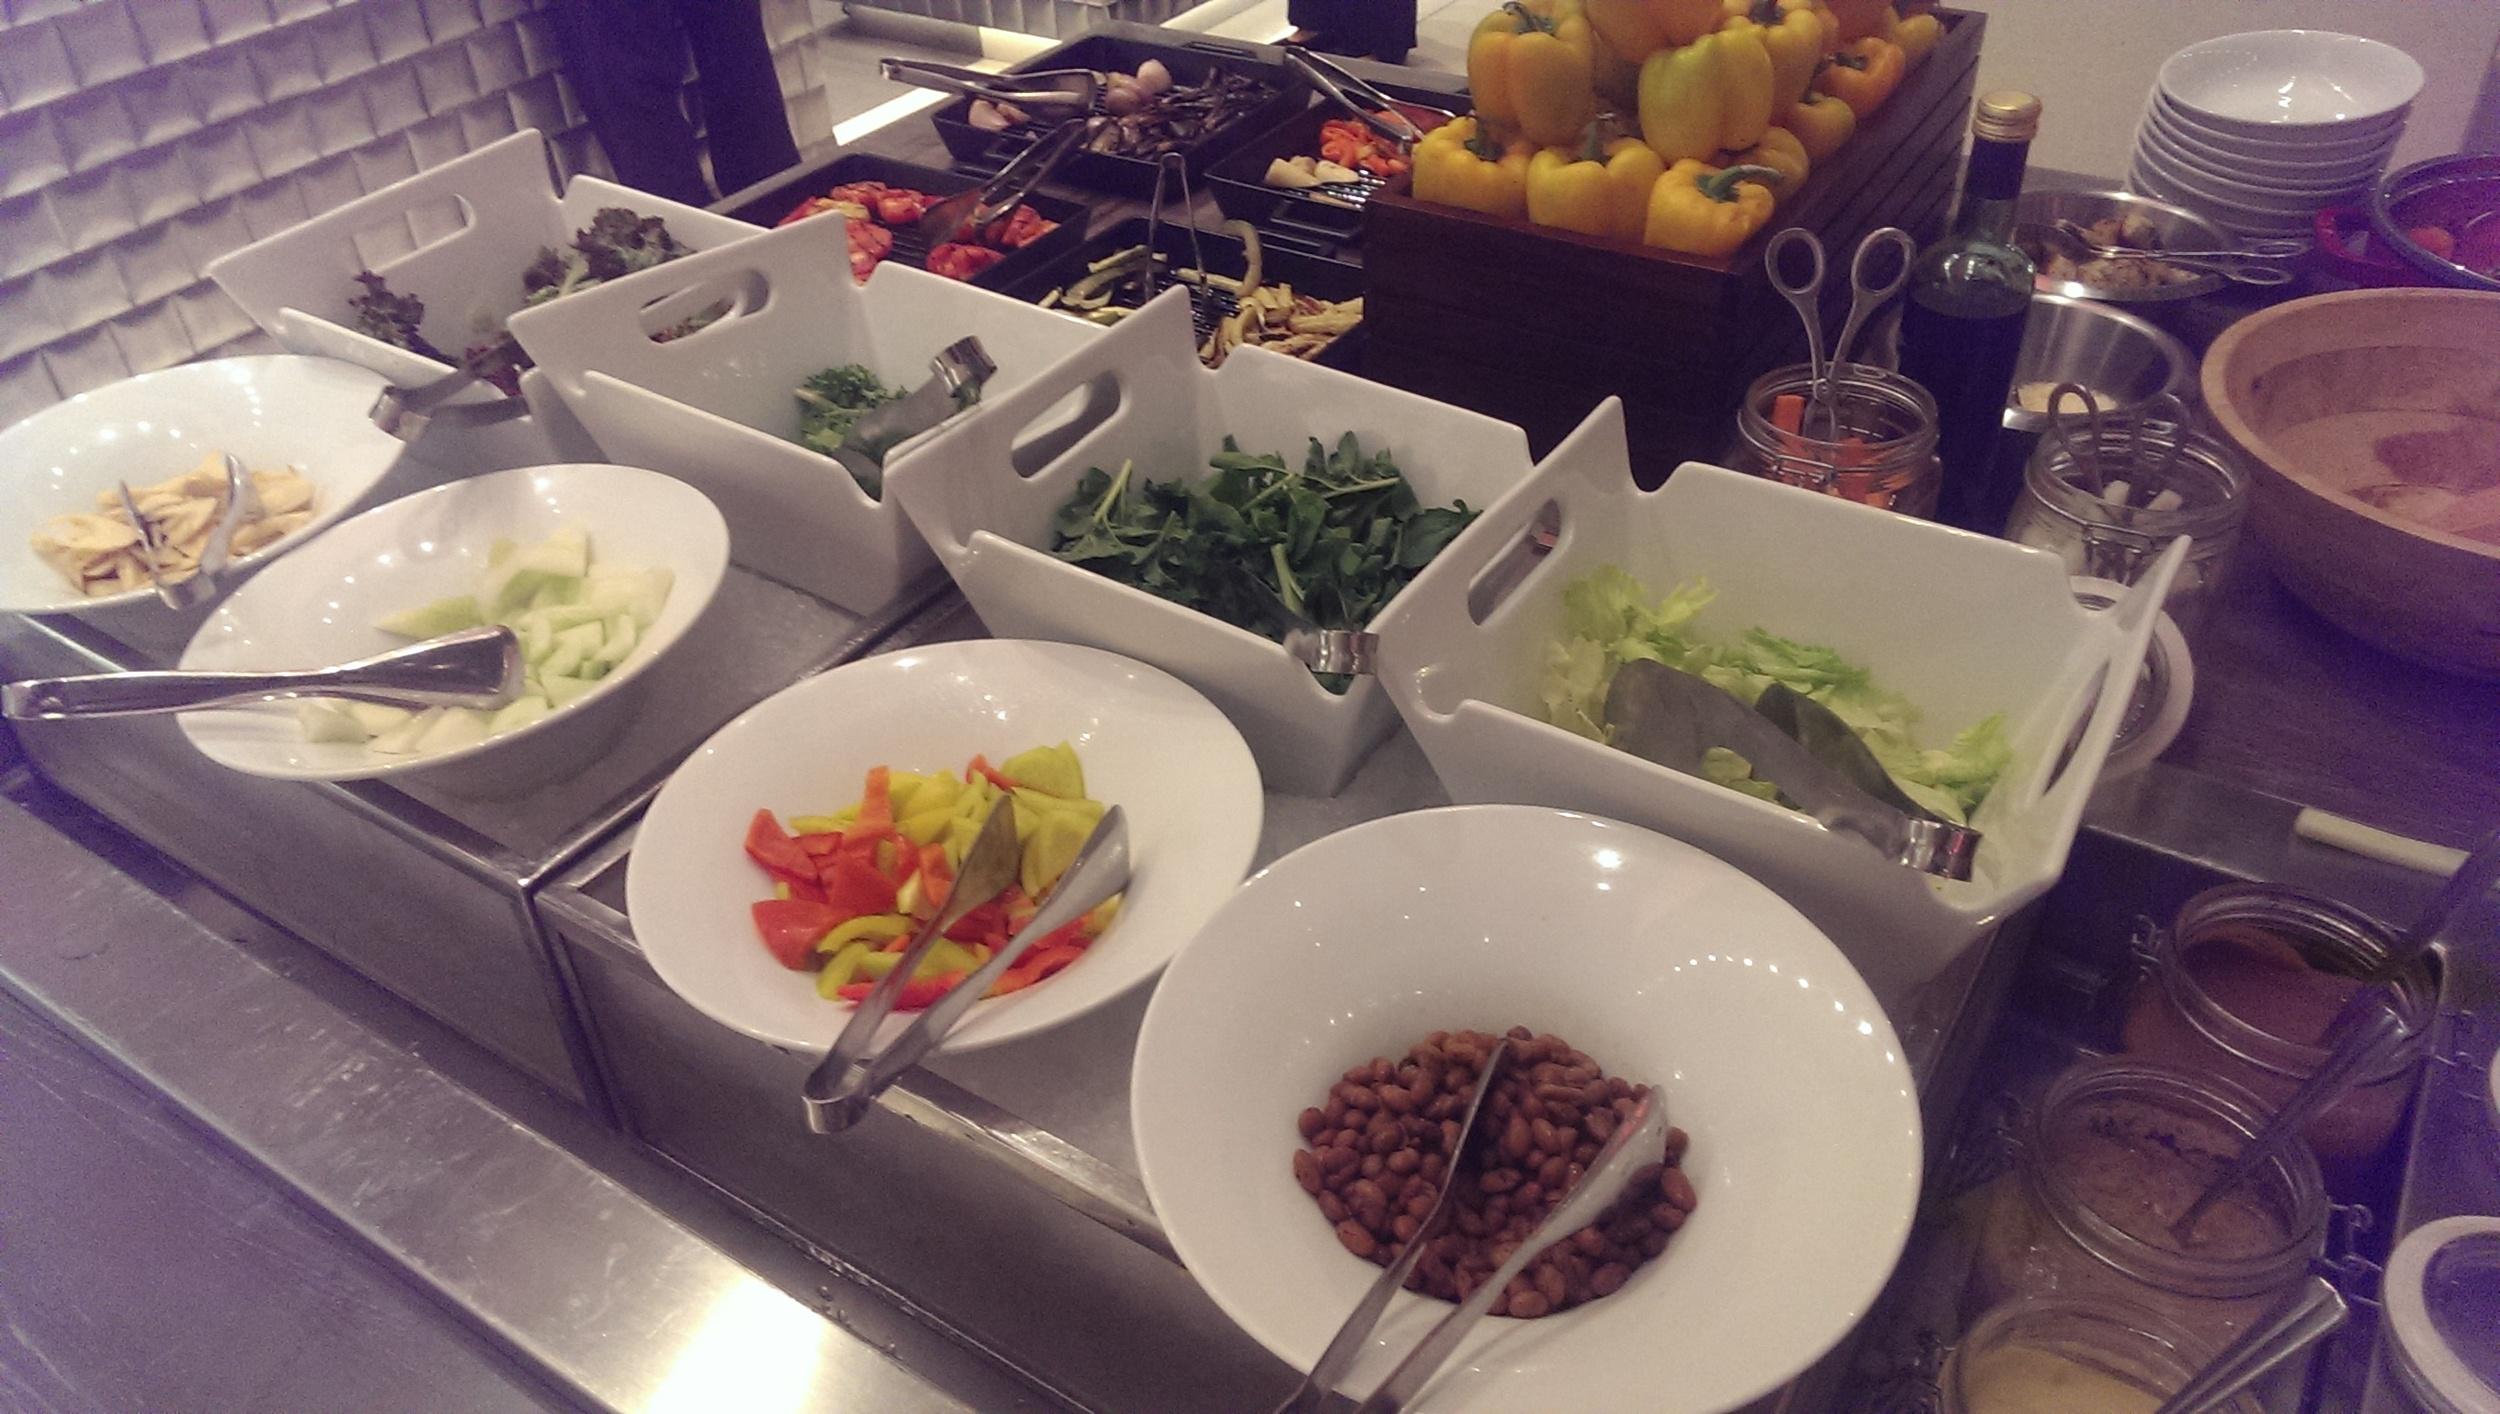 Fresh Veggies to customize your salad as you please @ JW Cafe, JW Sahar